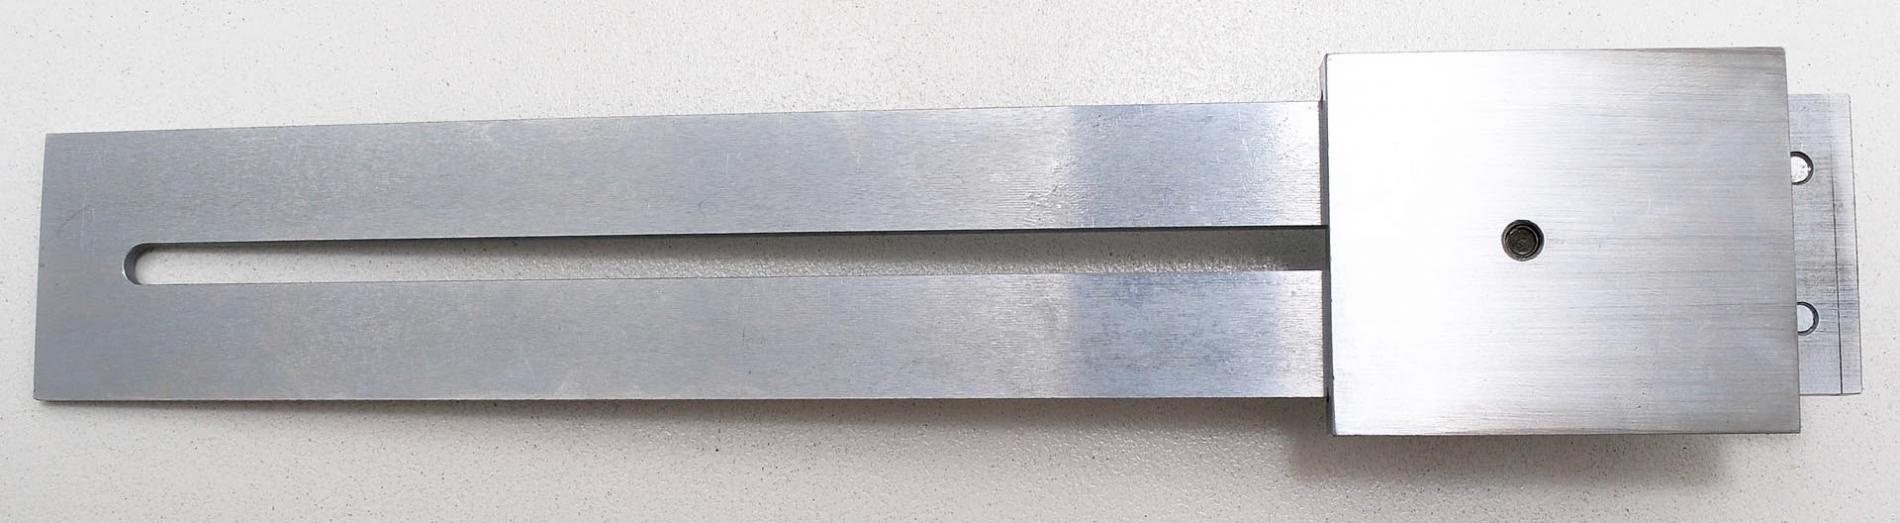 7120-200A-Gramil regla de precision para marcar 0-200mm INSIZE 7120-200A-max-7.